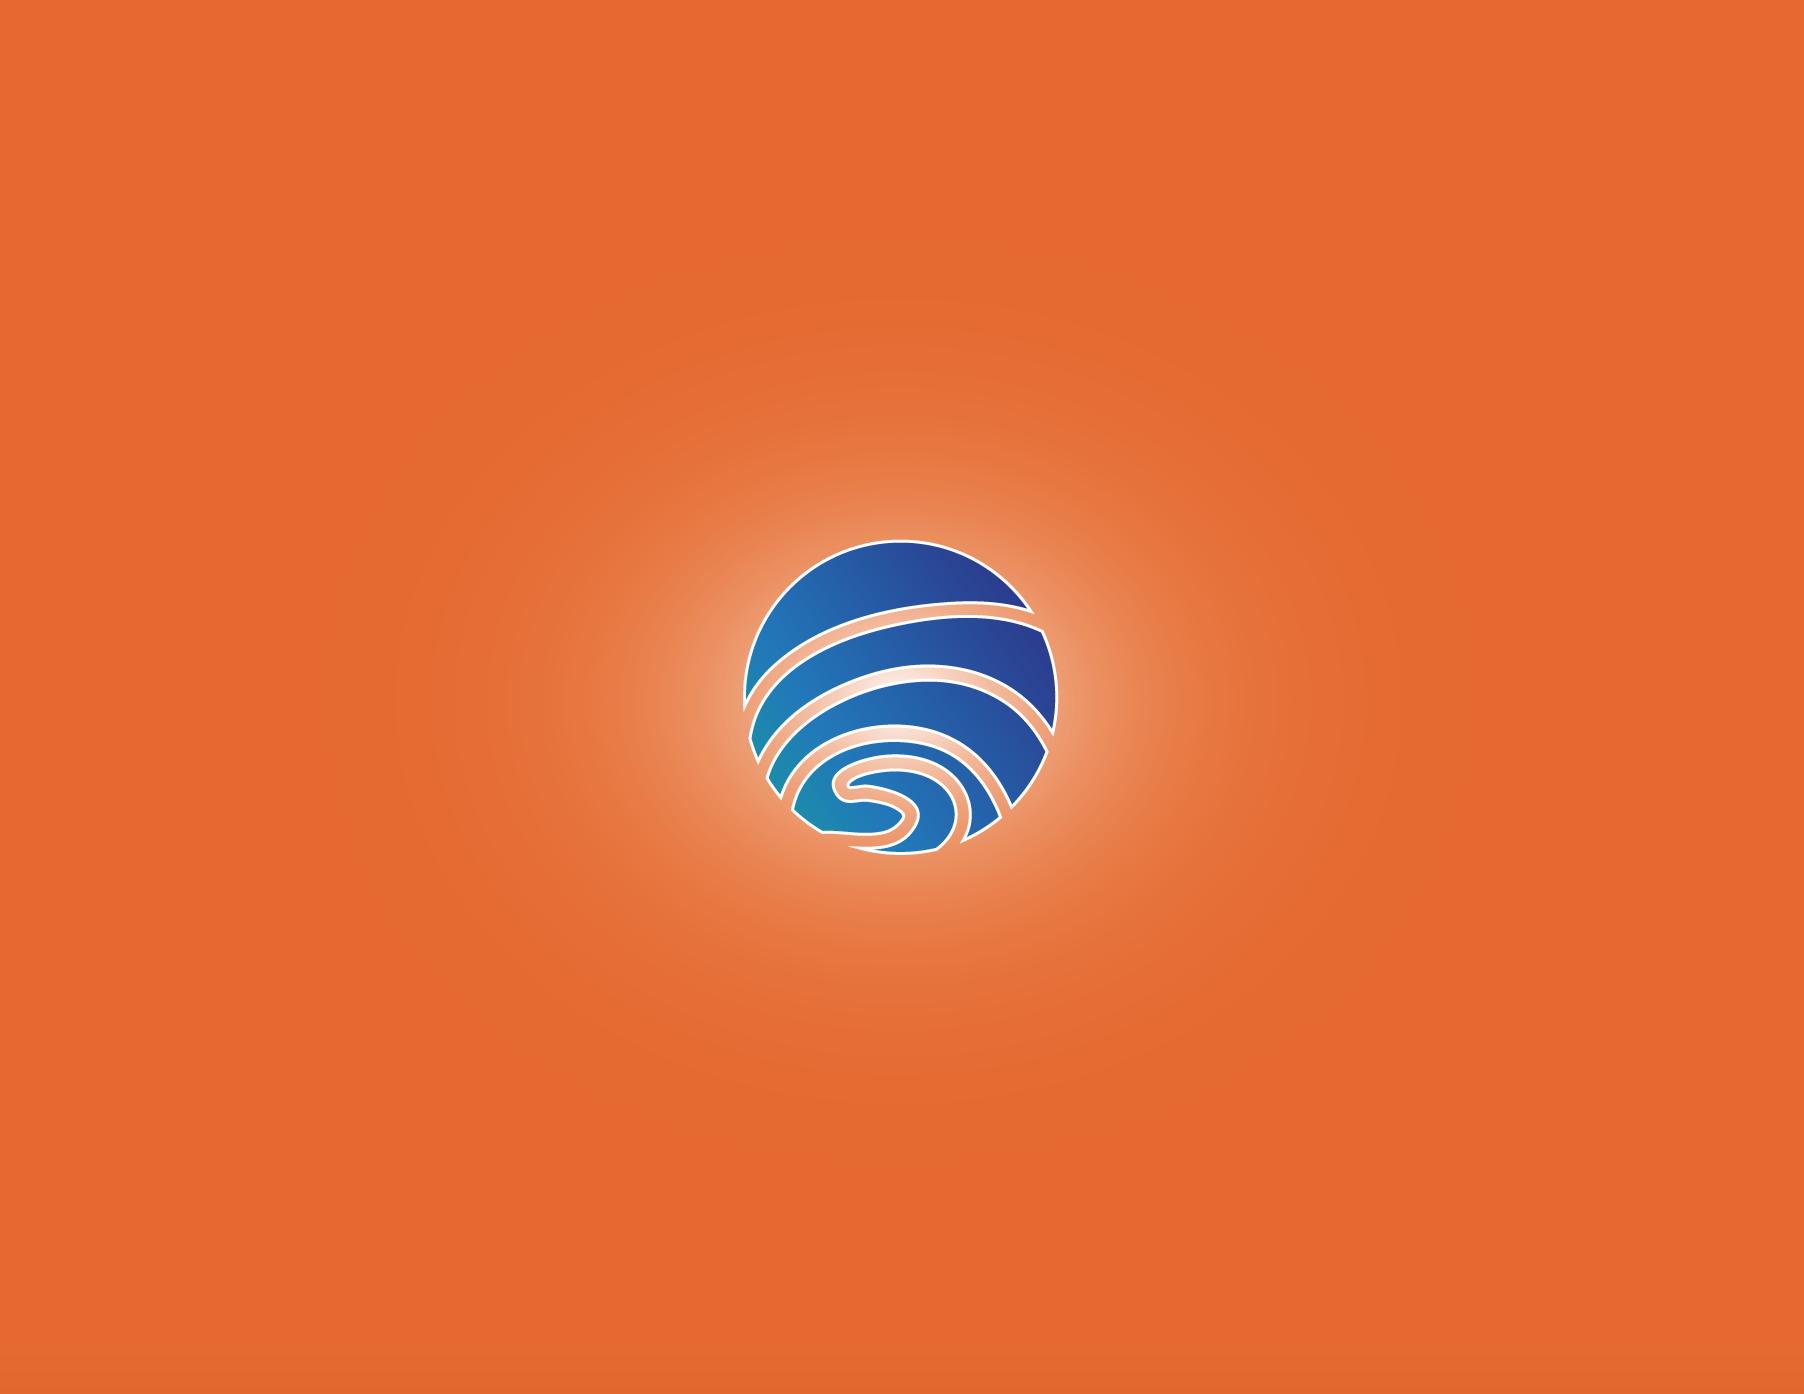 Predesigned logo